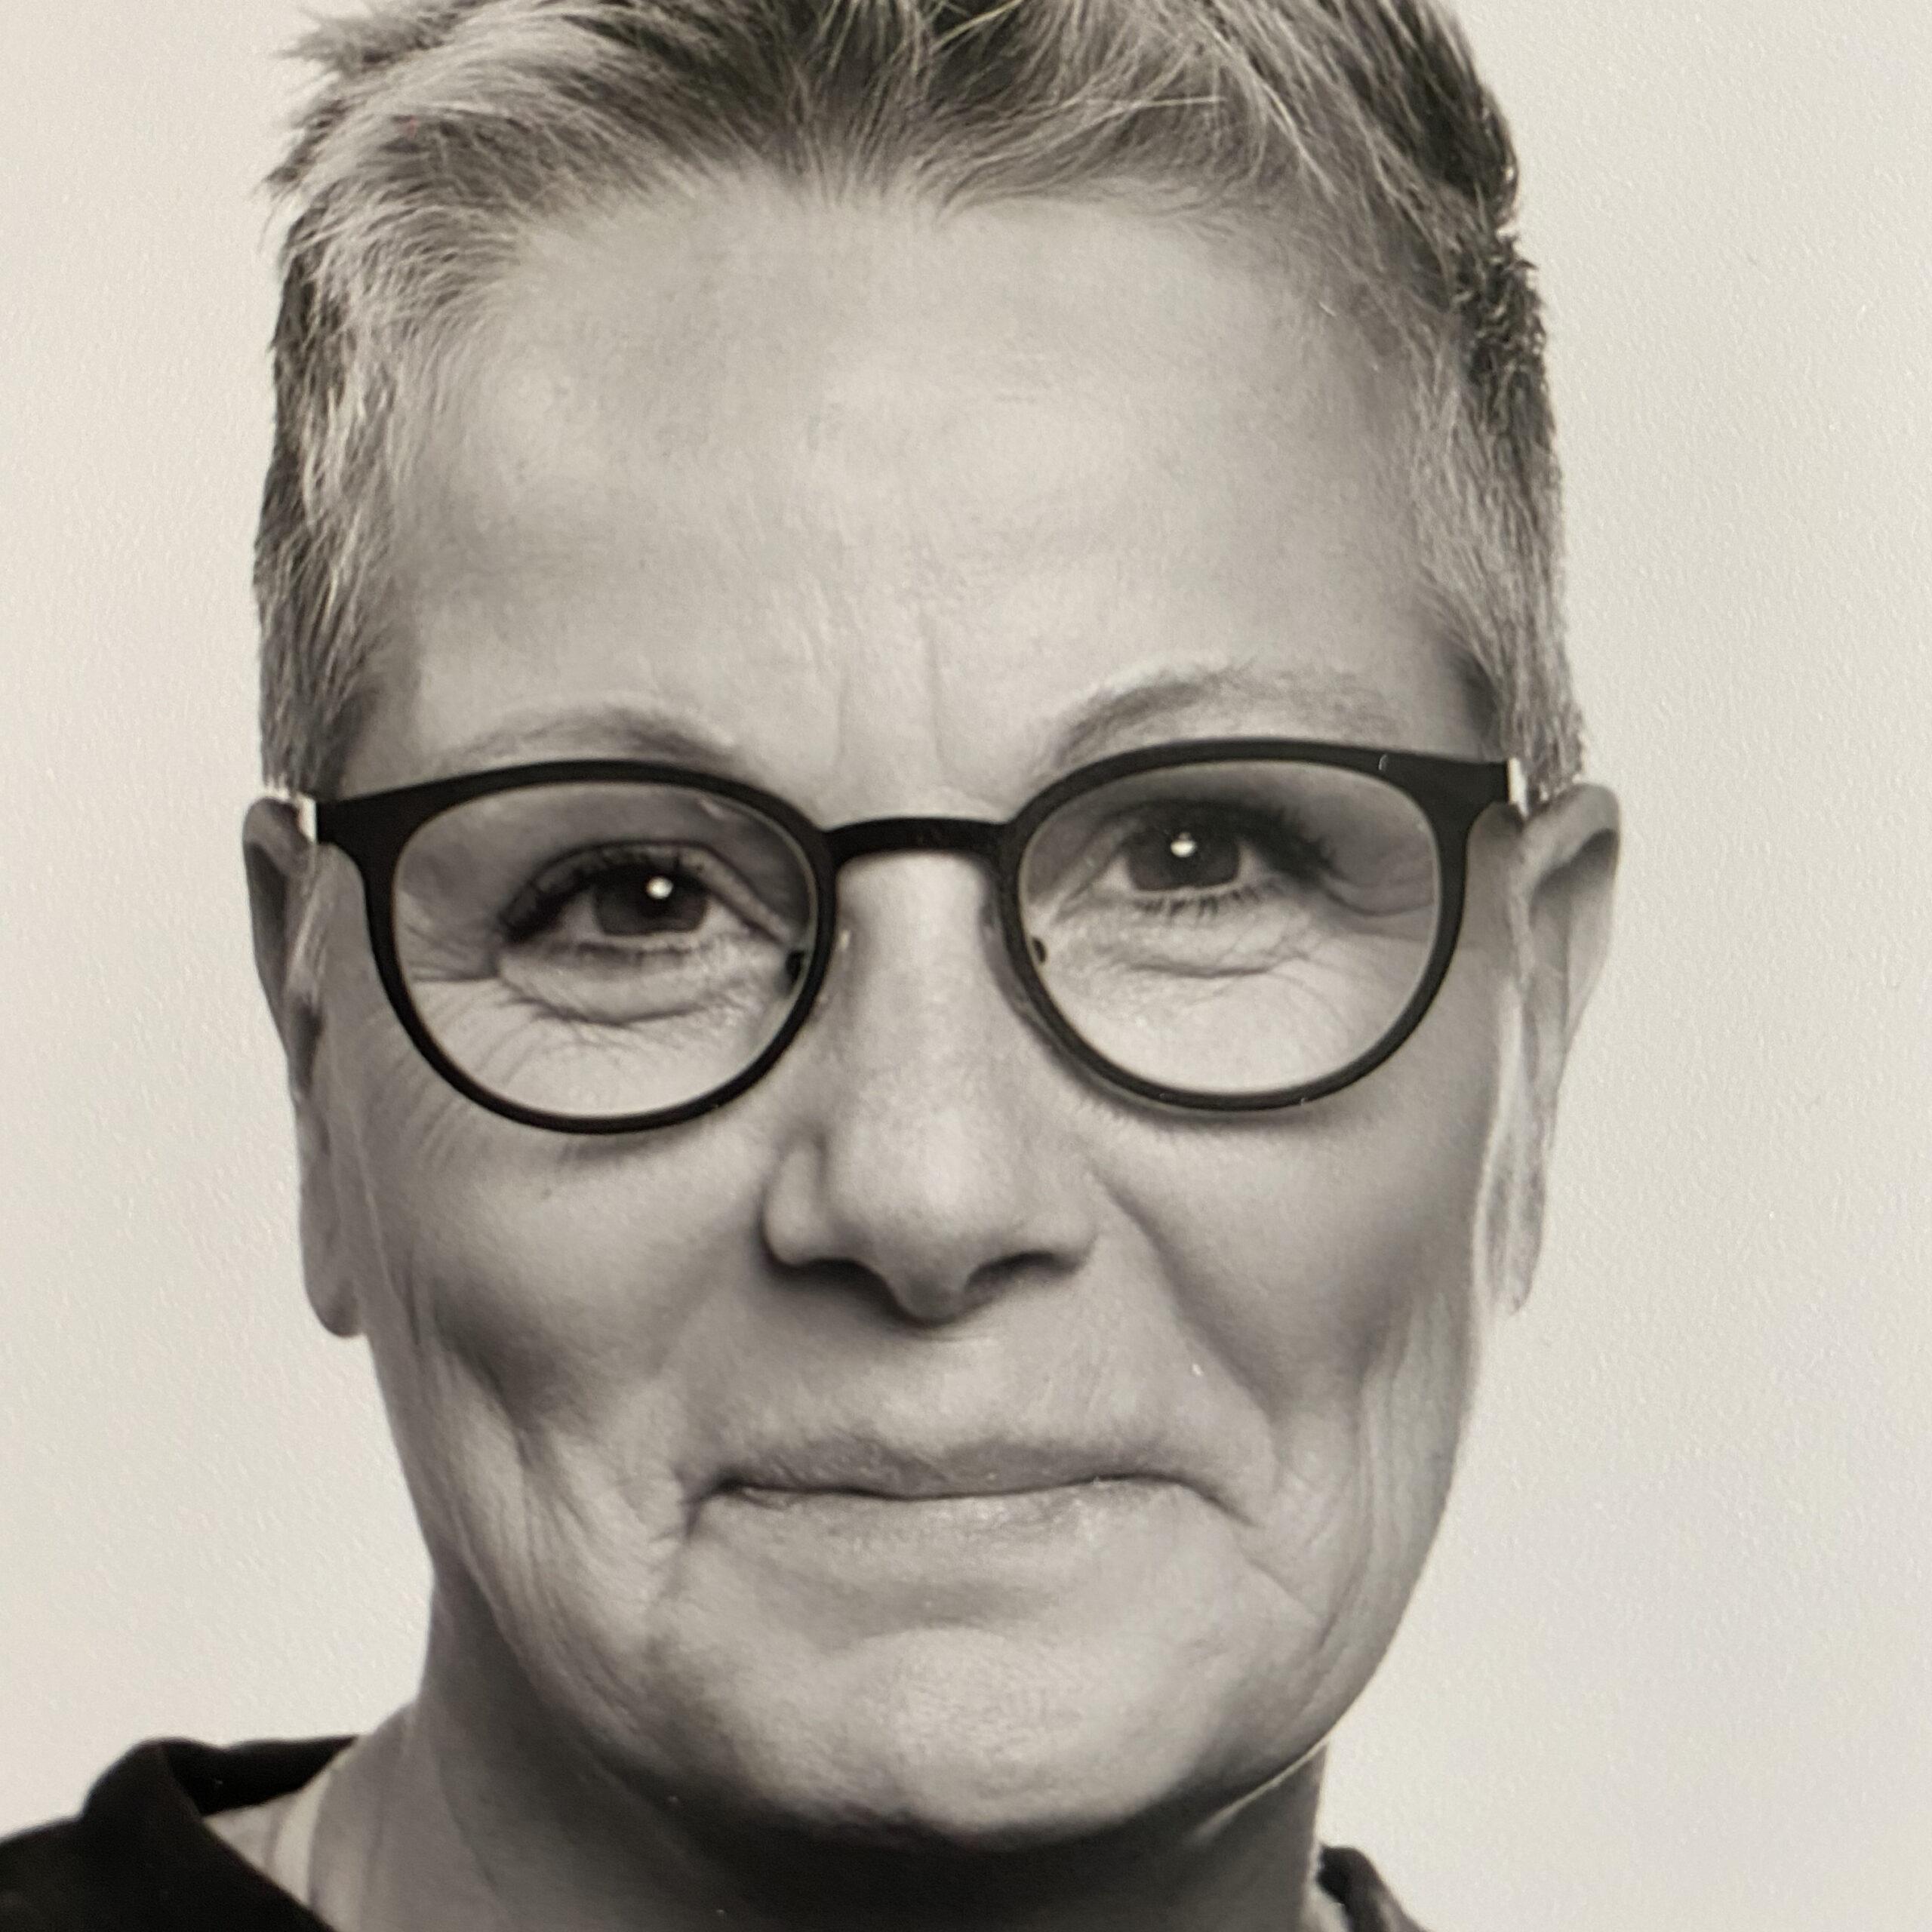 Bente Skadhauge-Jensen